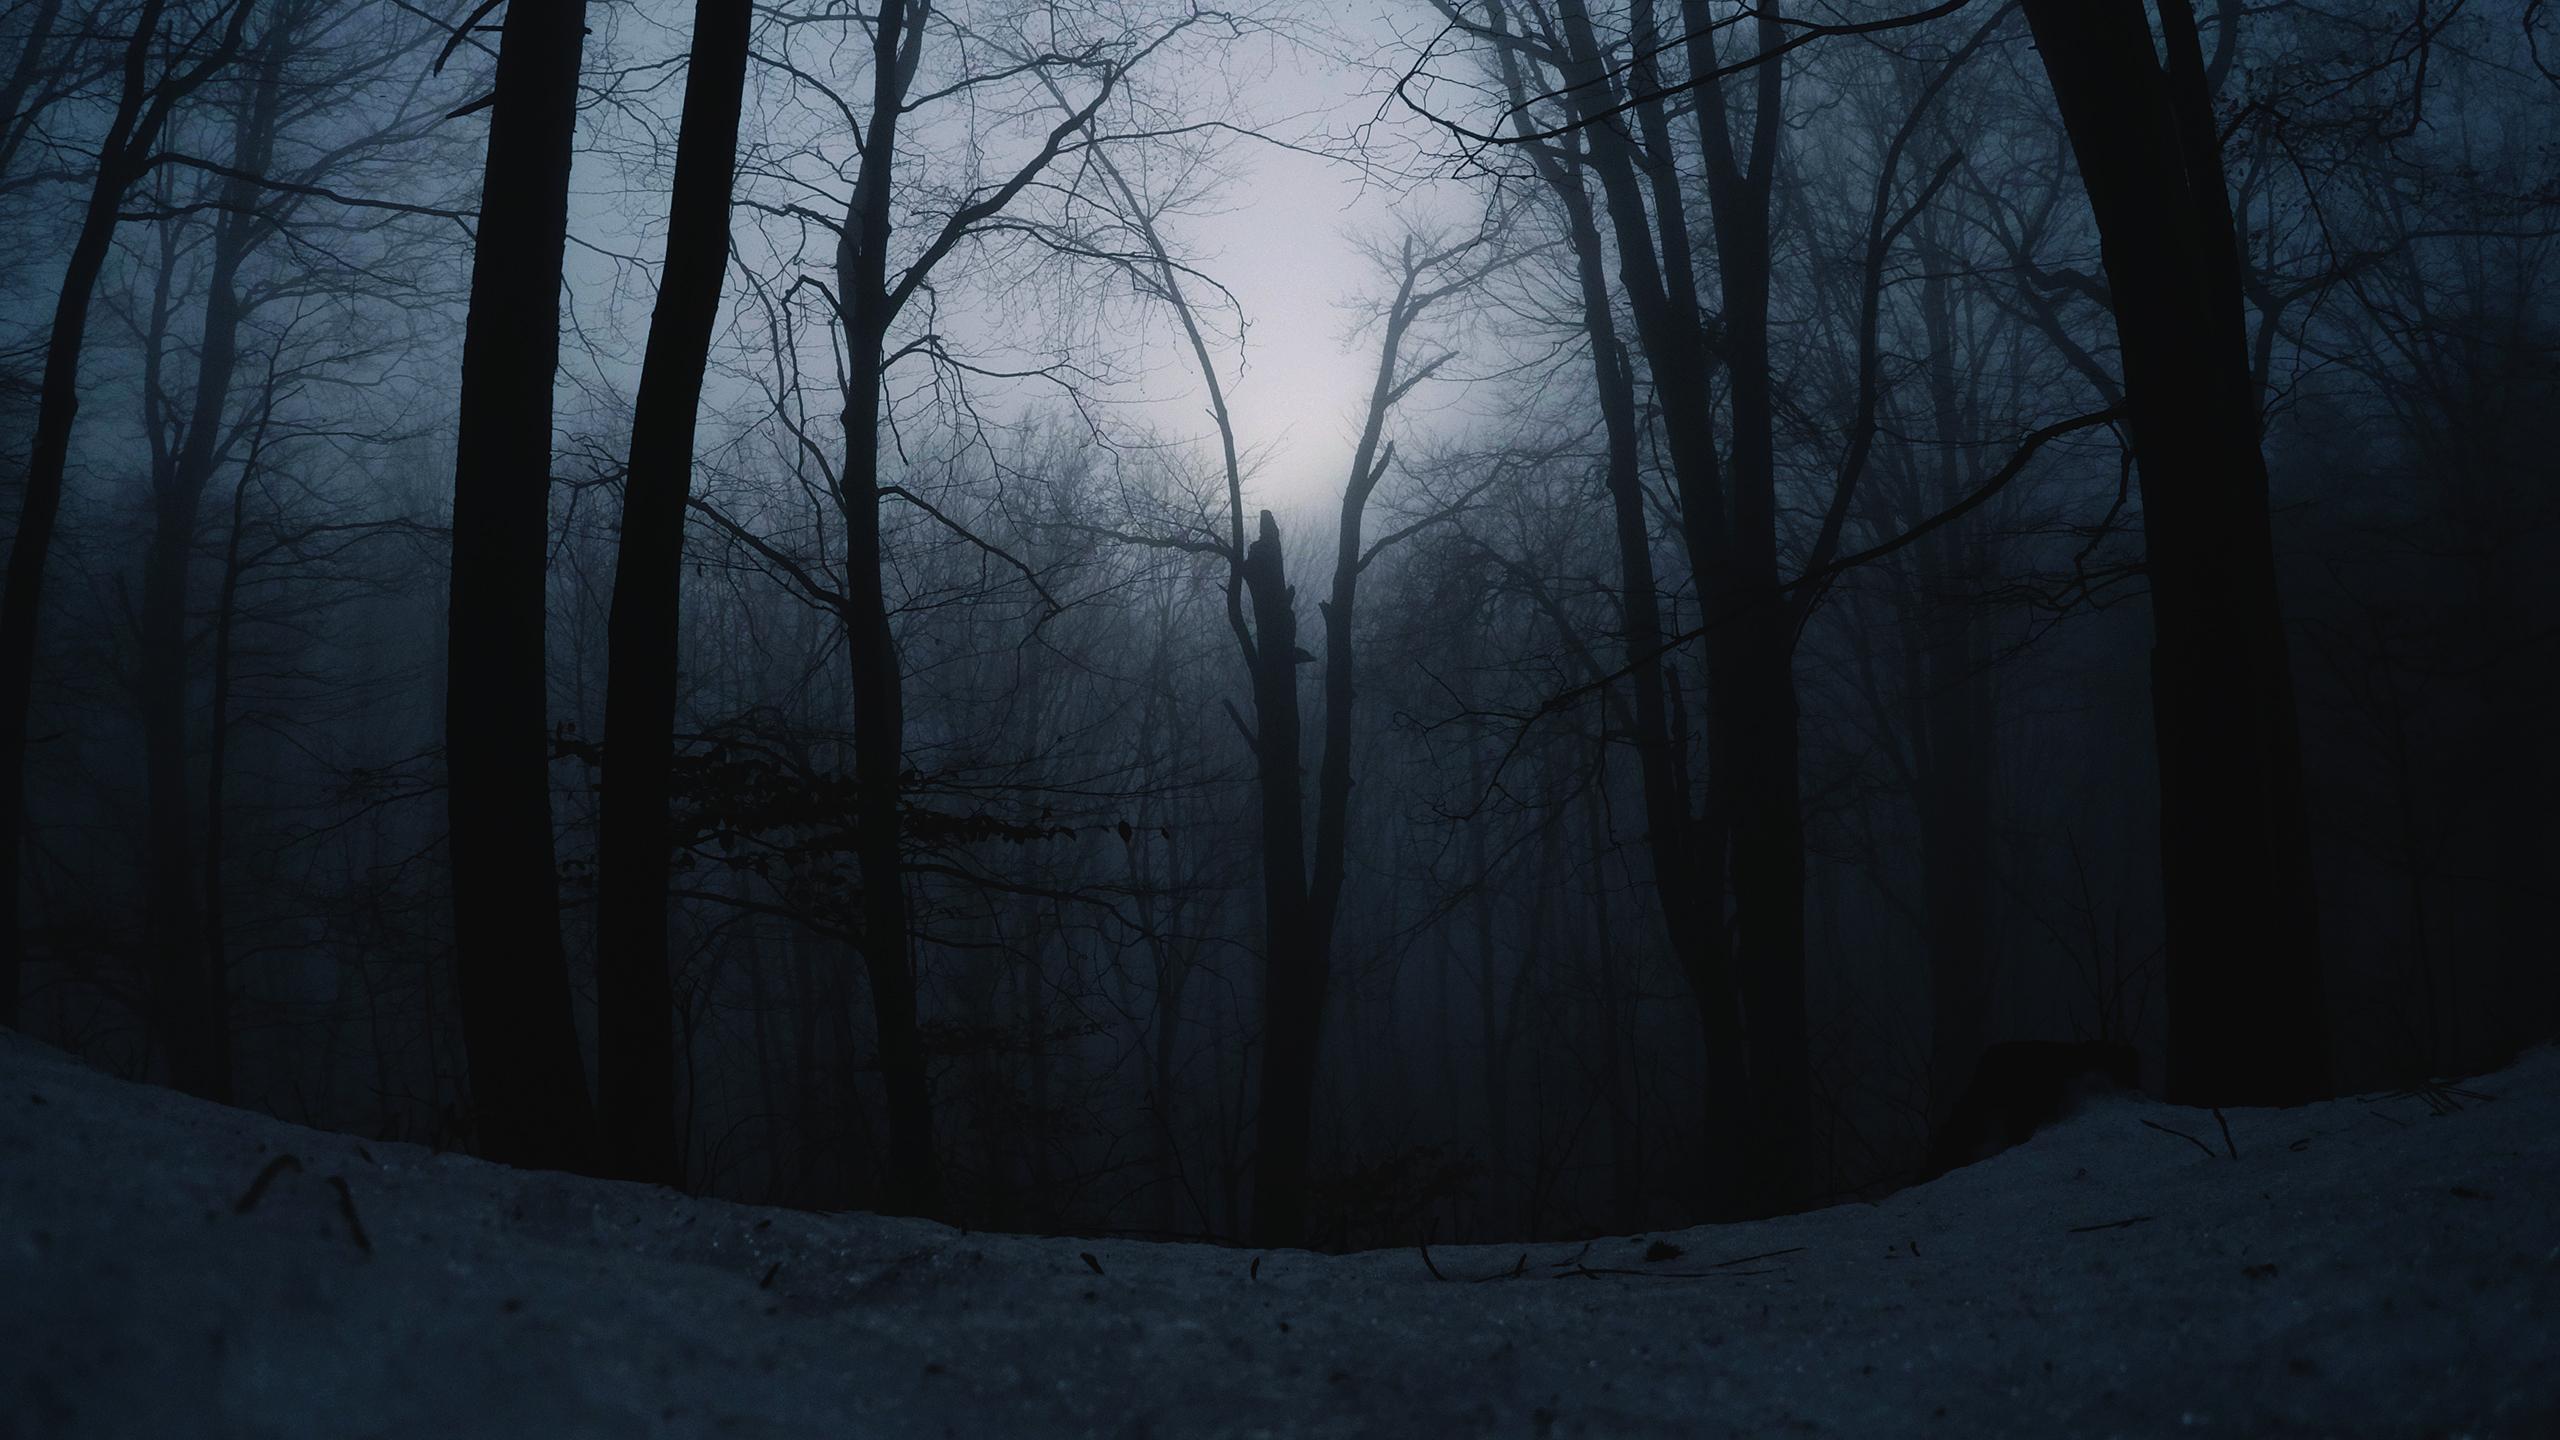 General 2560x1440 nature snow forest trees beech mist dusk